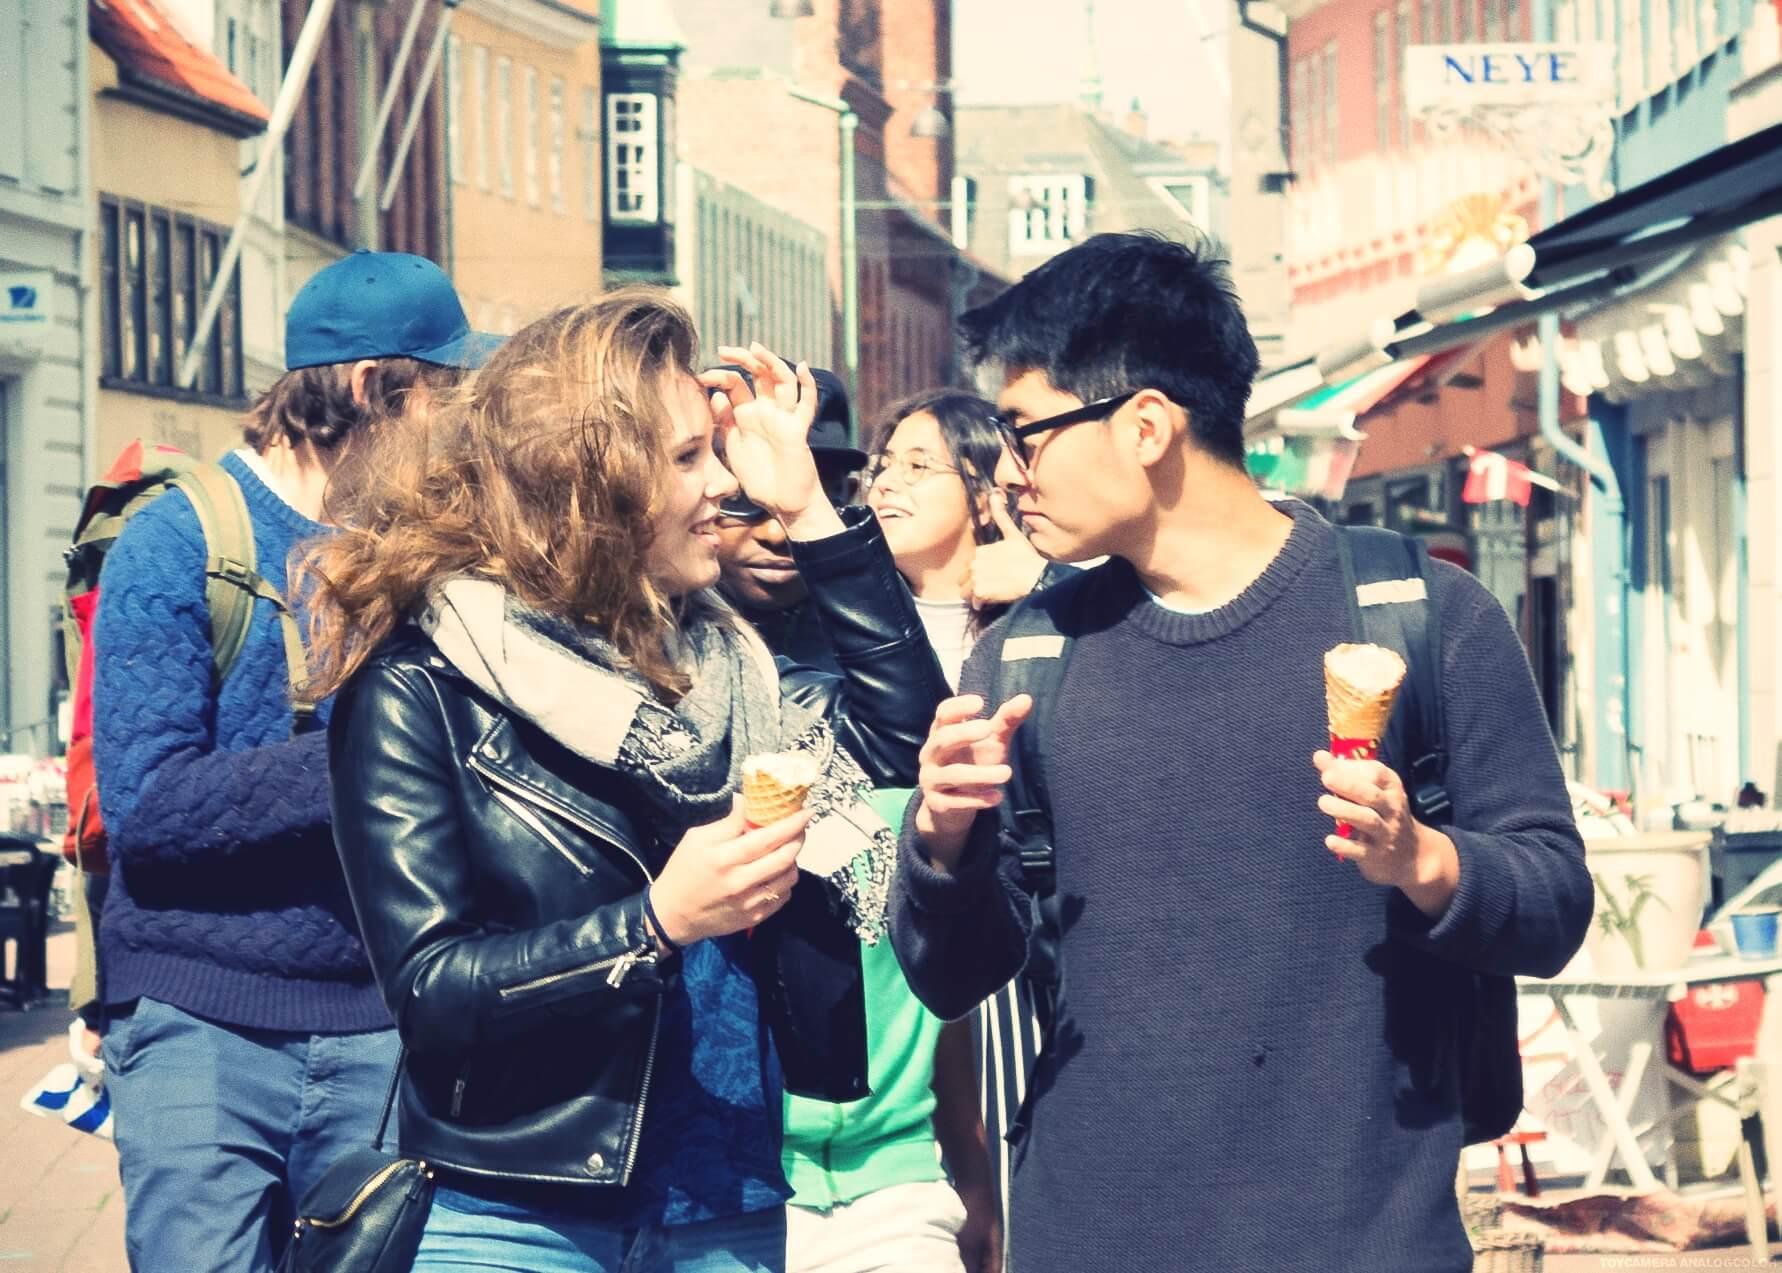 IPC - Eating Ice Cream in Helsingør aka Elsinore Folk High School in Denmark - International People's College